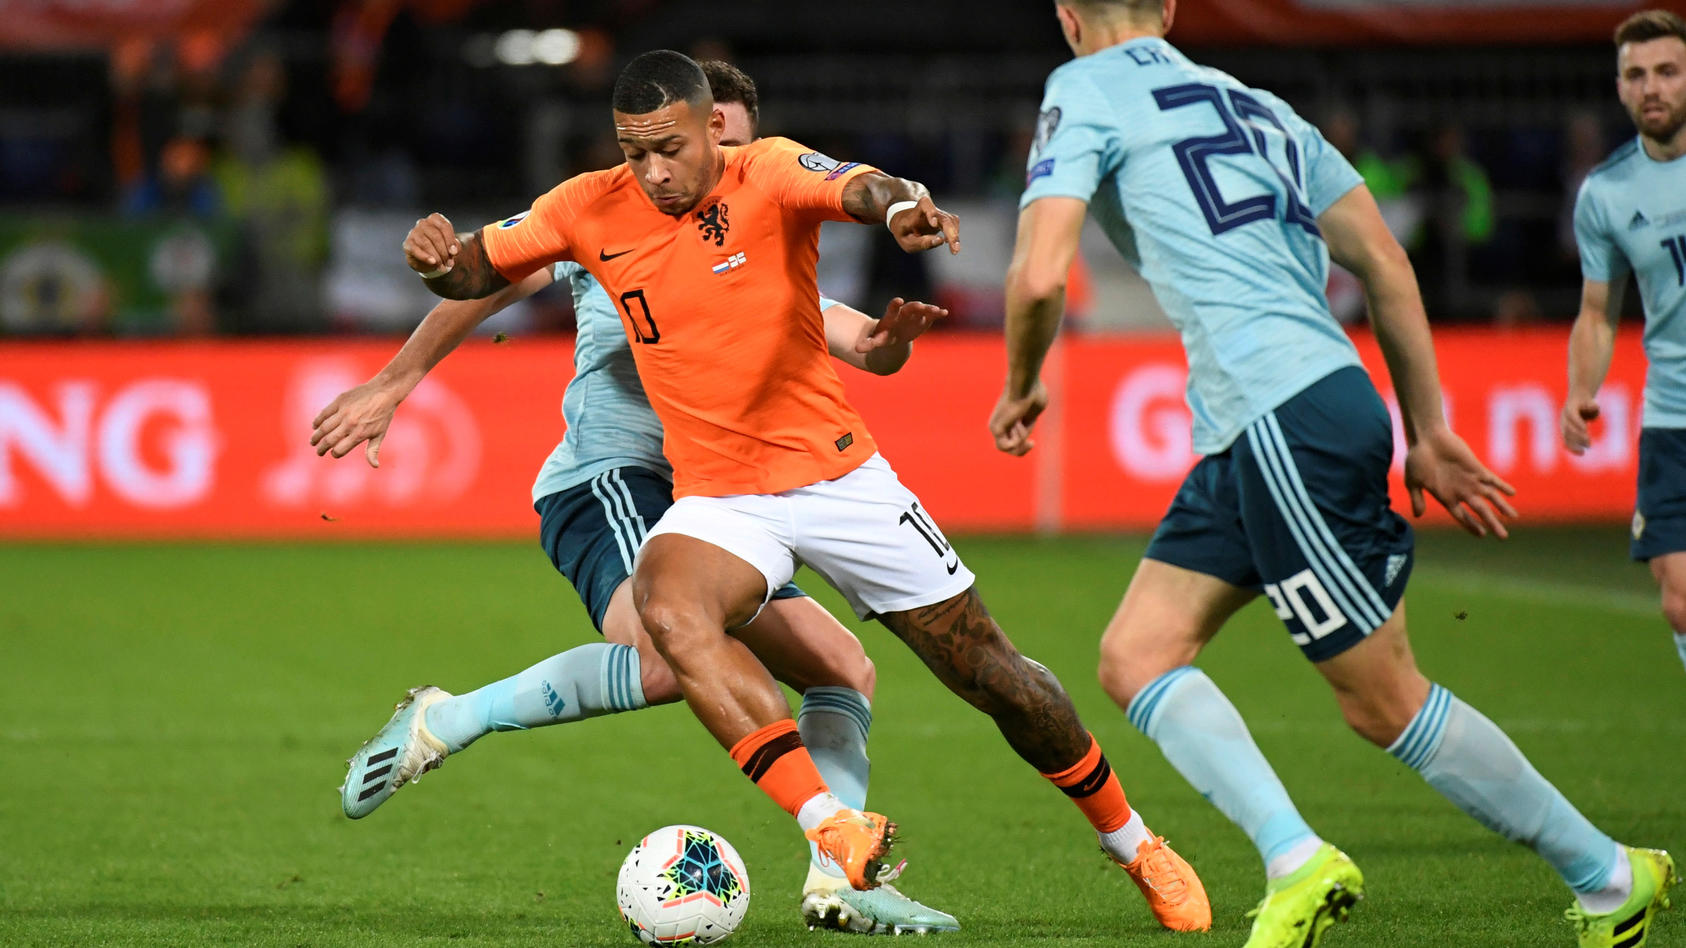 Euro 2020 Qualifier - Group C - Netherlands v Northern Ireland